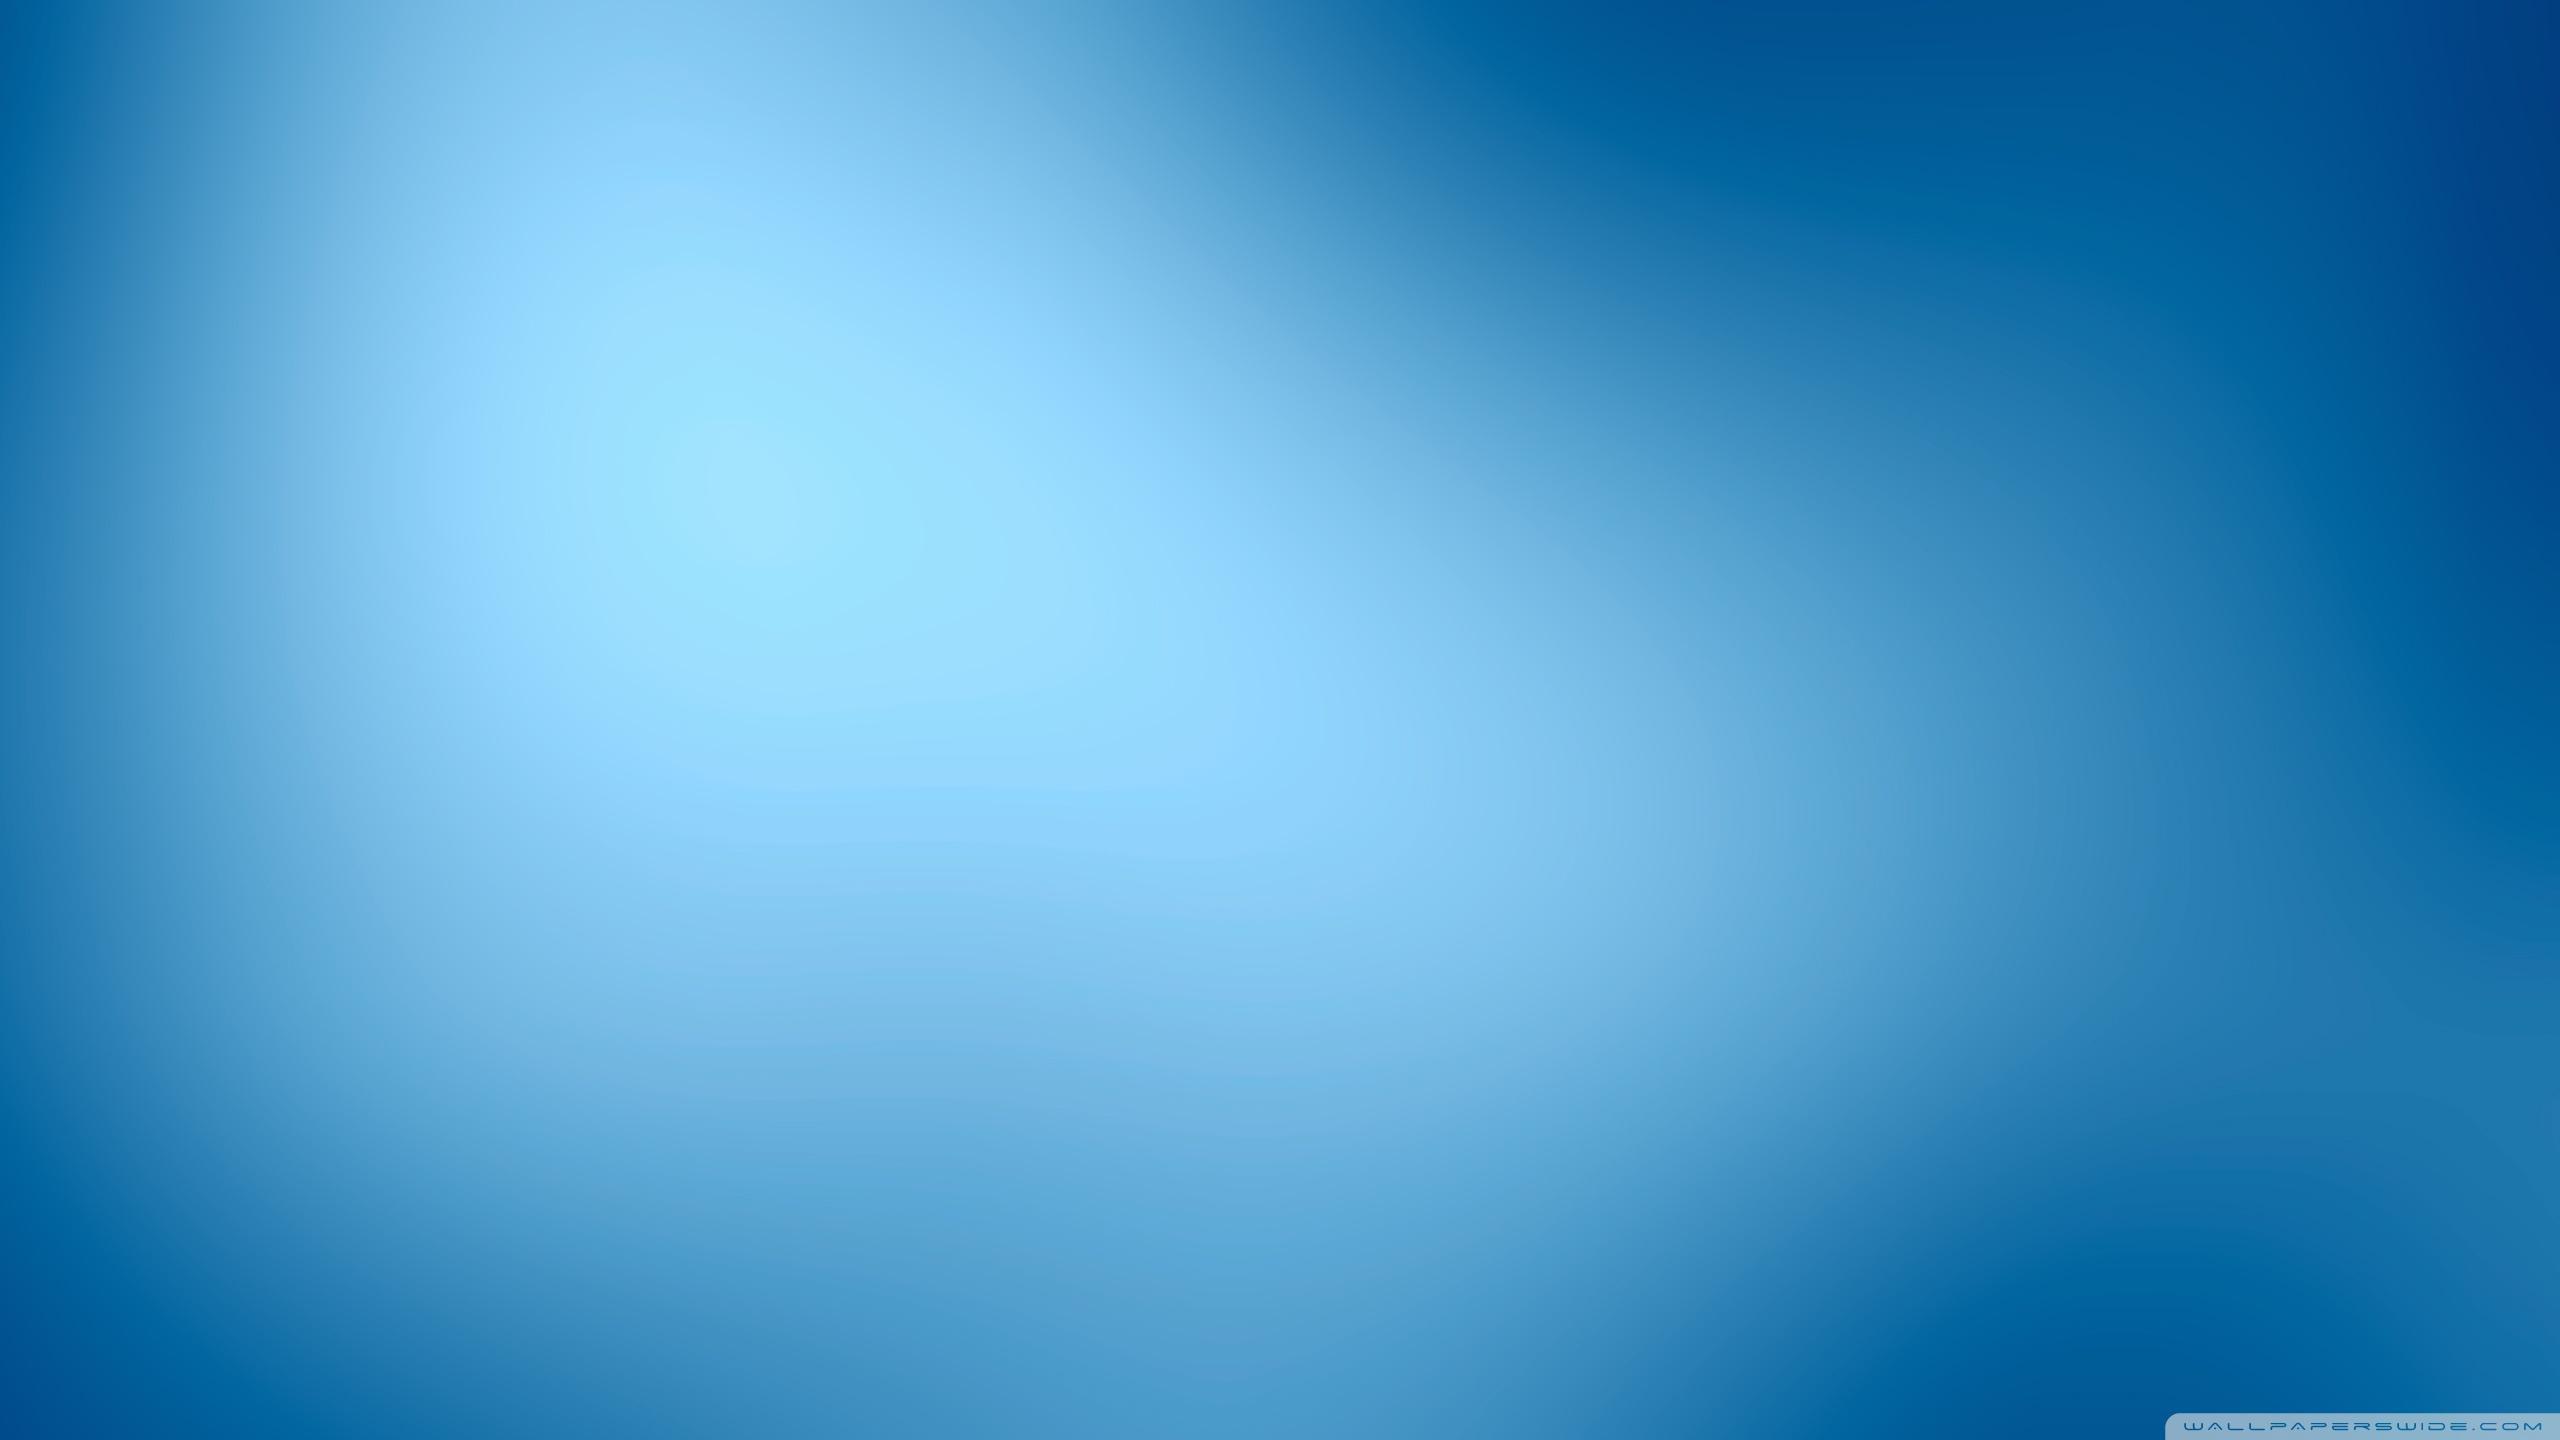 Background wallpaper 2560x1440 39703 2560x1440